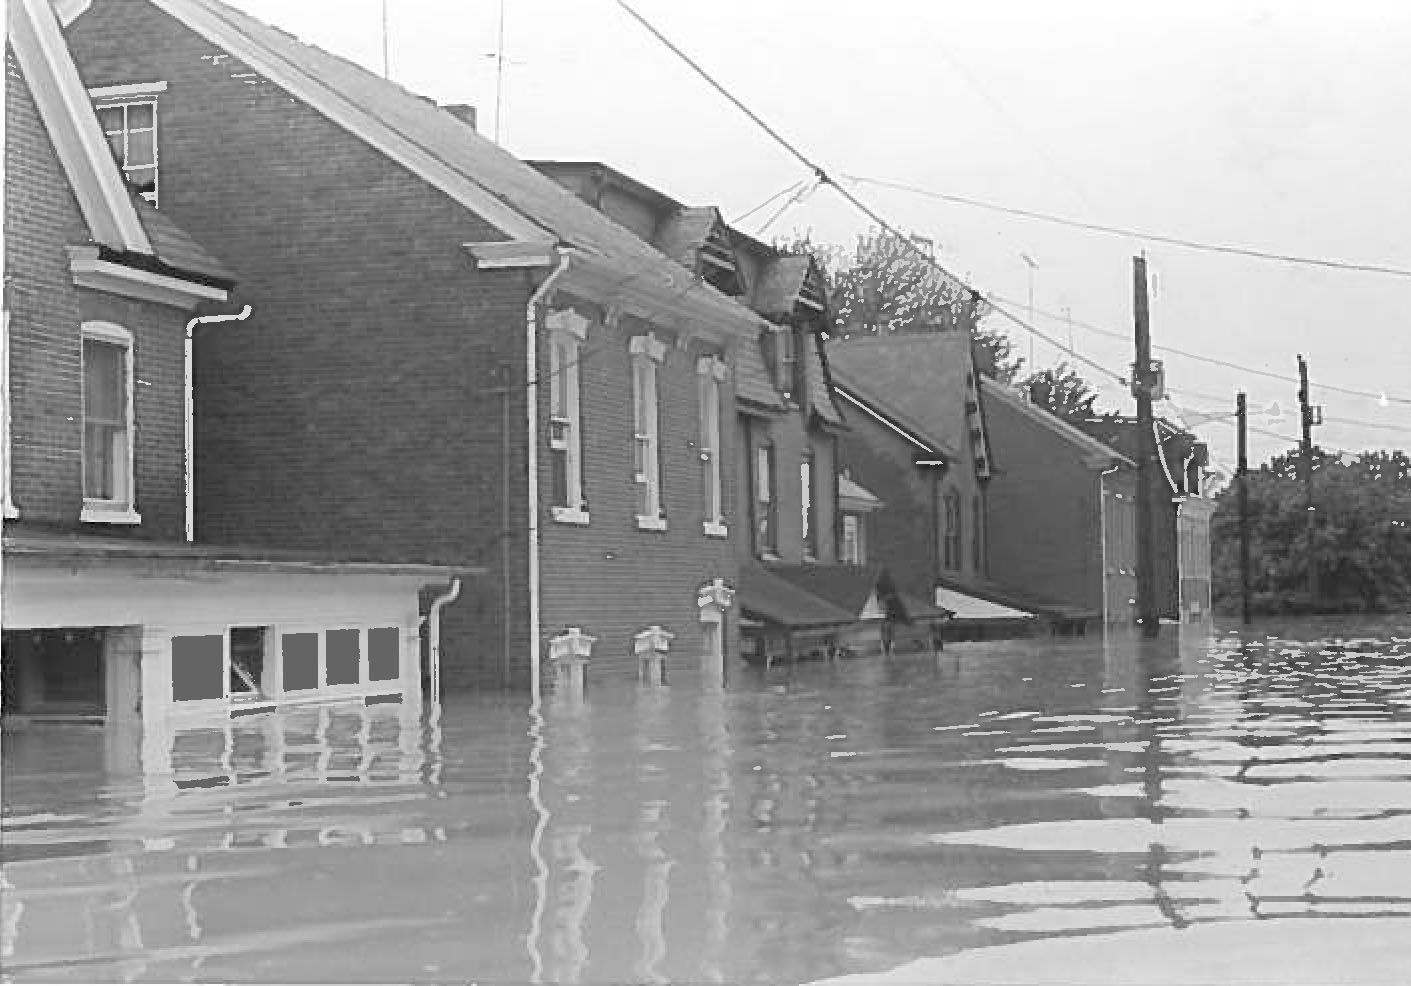 Walnut Street In Pottstown Pa Flooded During Hurricane Agnes In 1972 Photo Courtesy Judy Palladino Pennsylvania History Interesting History Pottstown